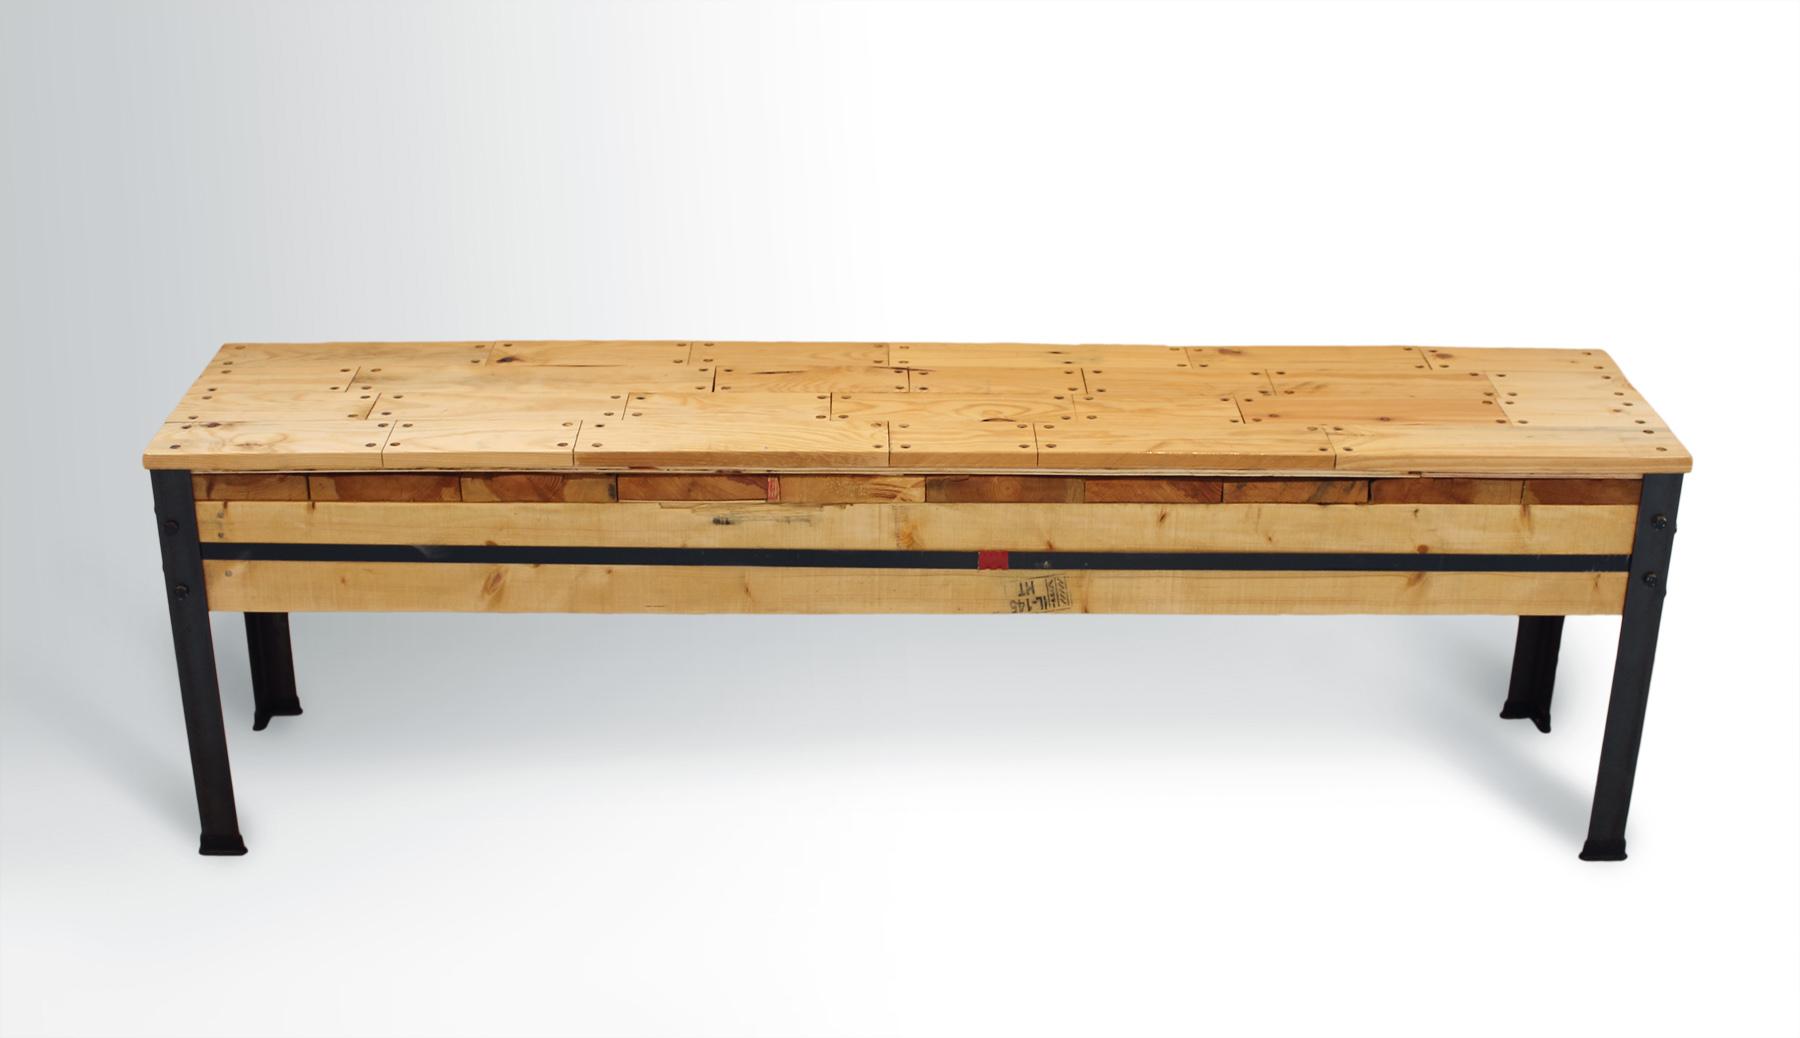 Deck Pattern Bench Ari Shomron Designs